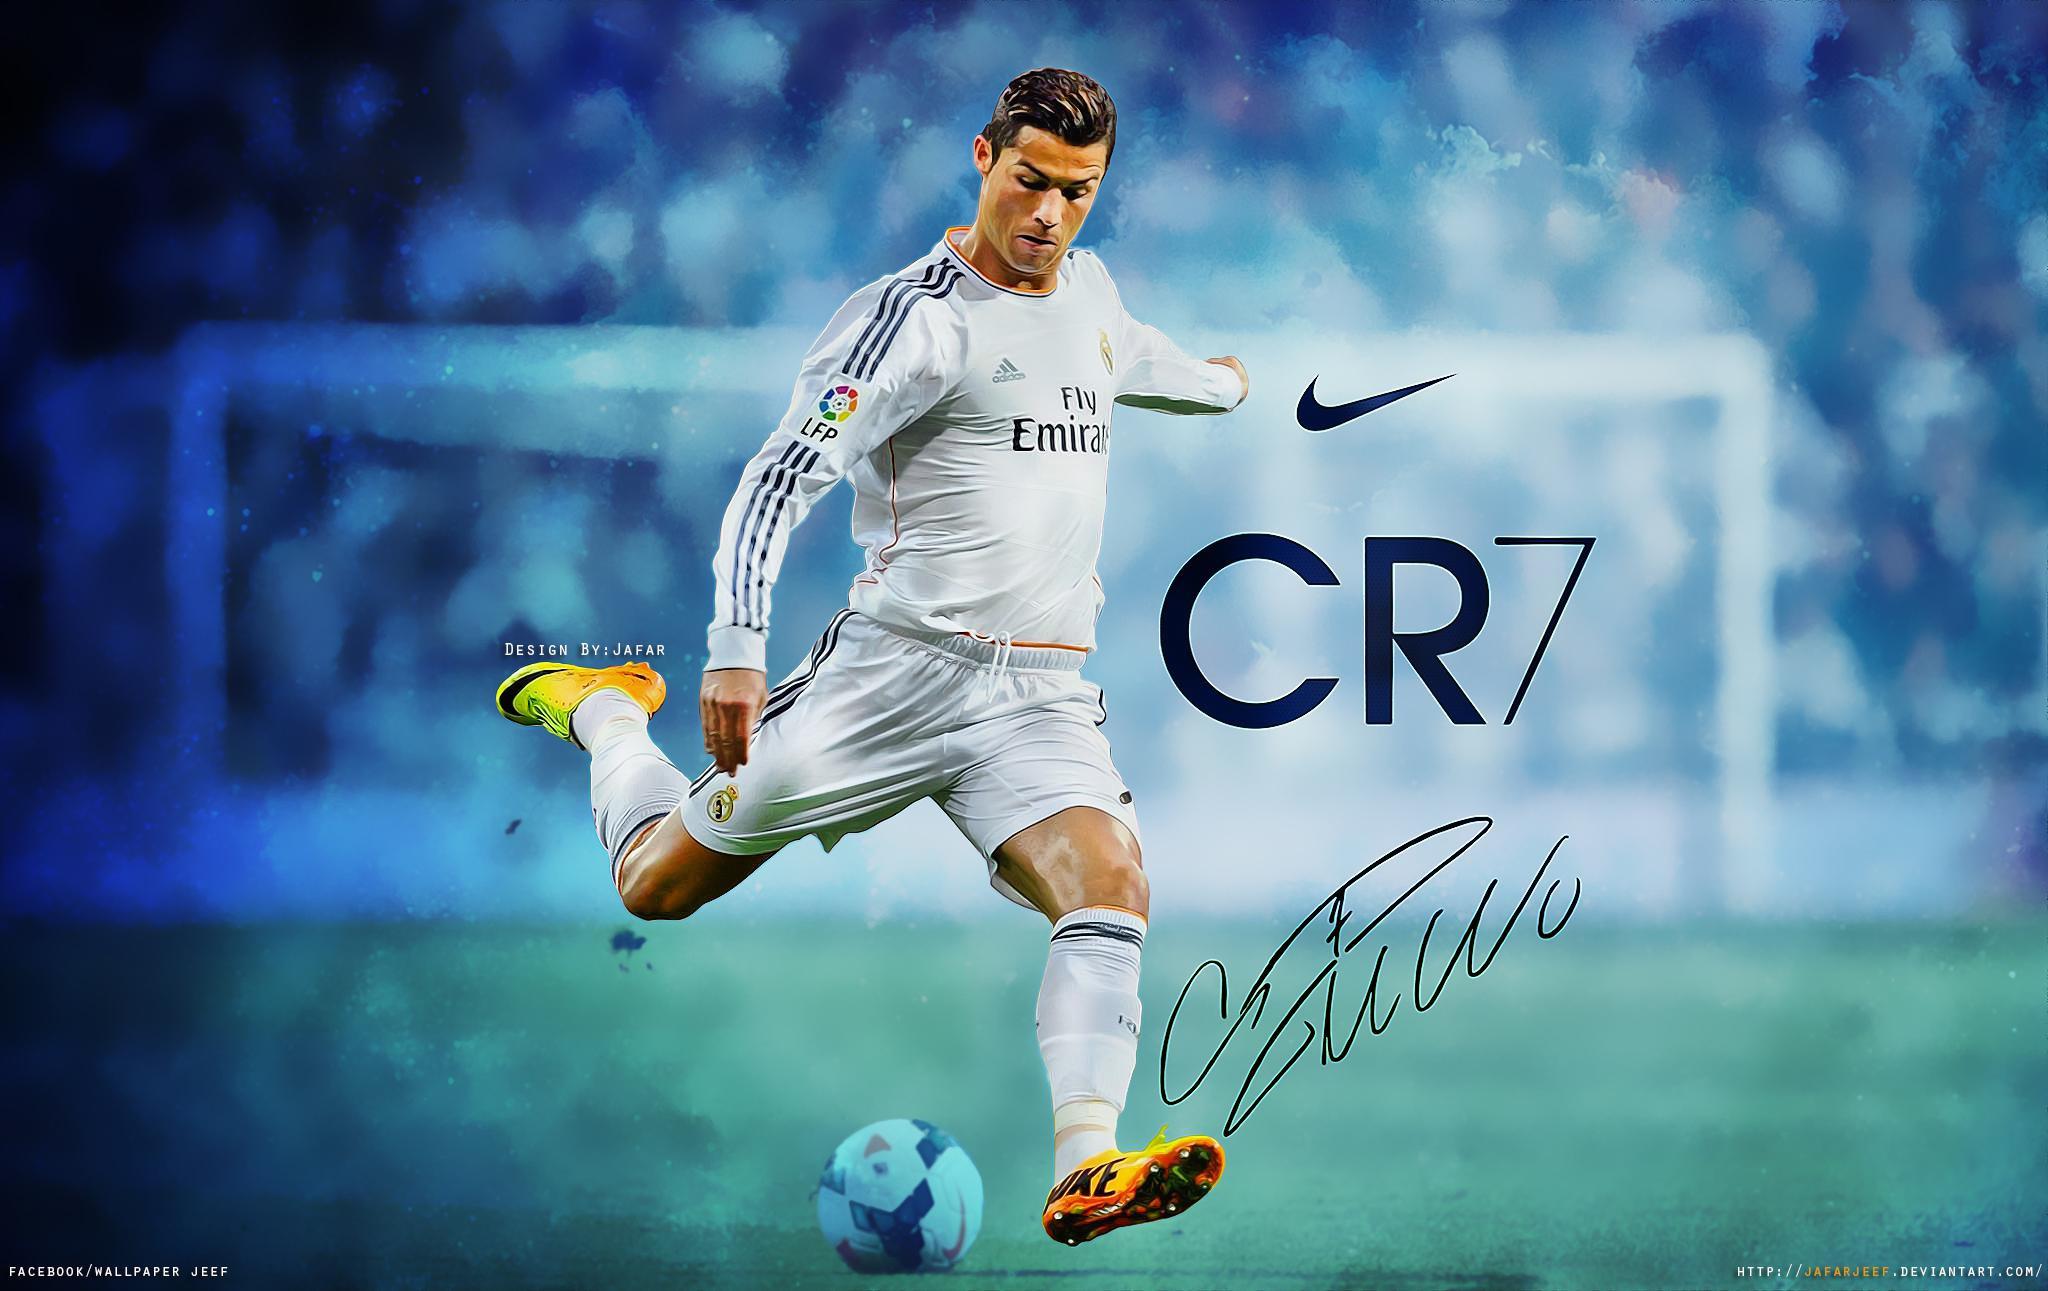 46 Cristiano Ronaldo Wallpaper For Iphone On Wallpapersafari